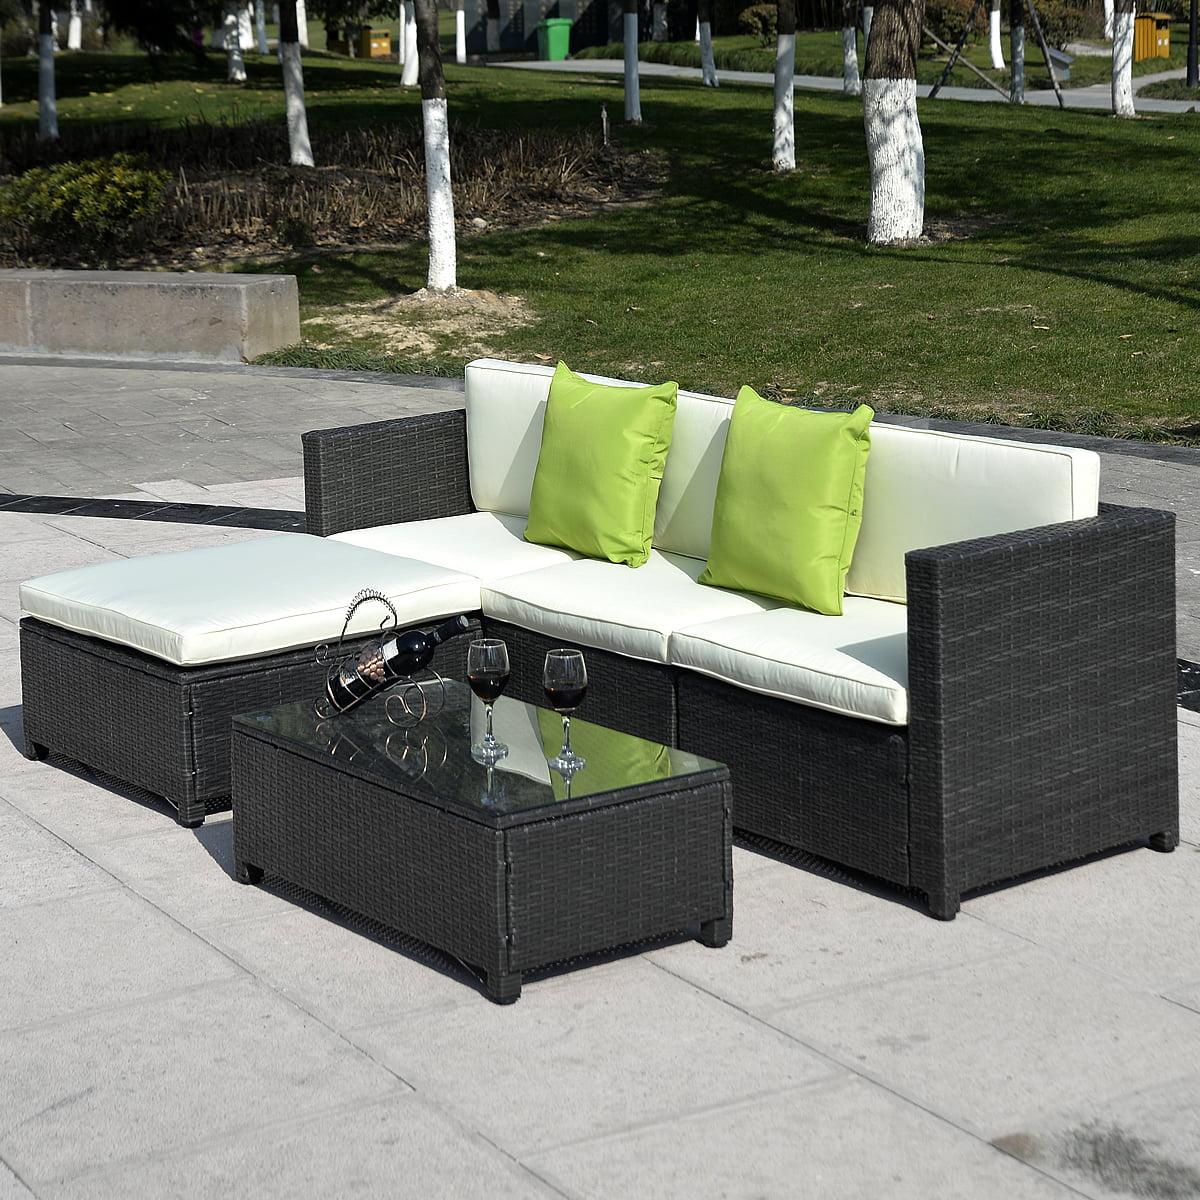 black outdoor sofa rv jack knife cover rattan set with corner